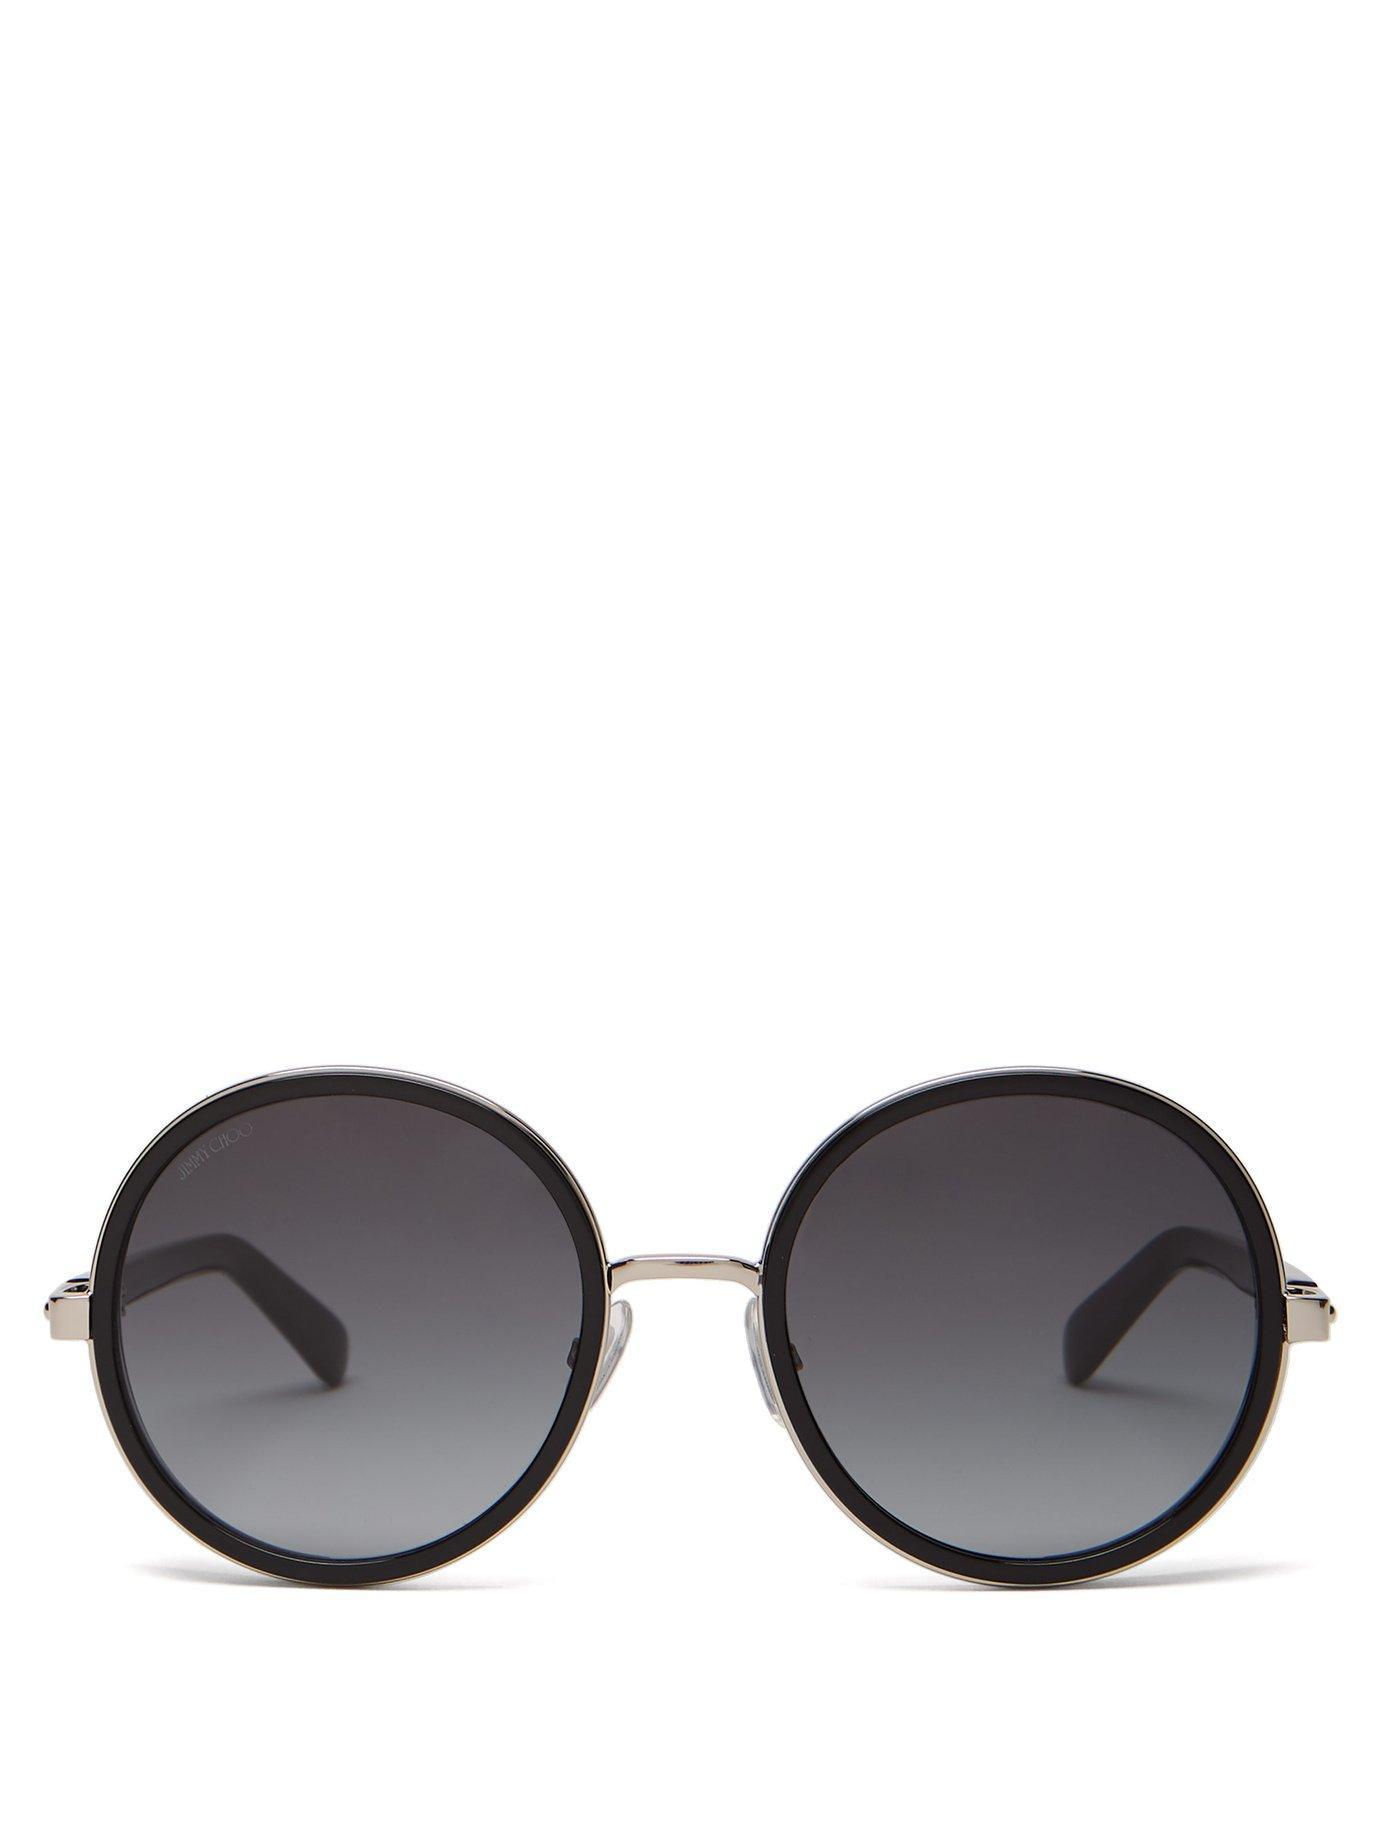 fc337b9e9c32 Lyst - Jimmy Choo Andie Glitter Round Frame Sunglasses in Black